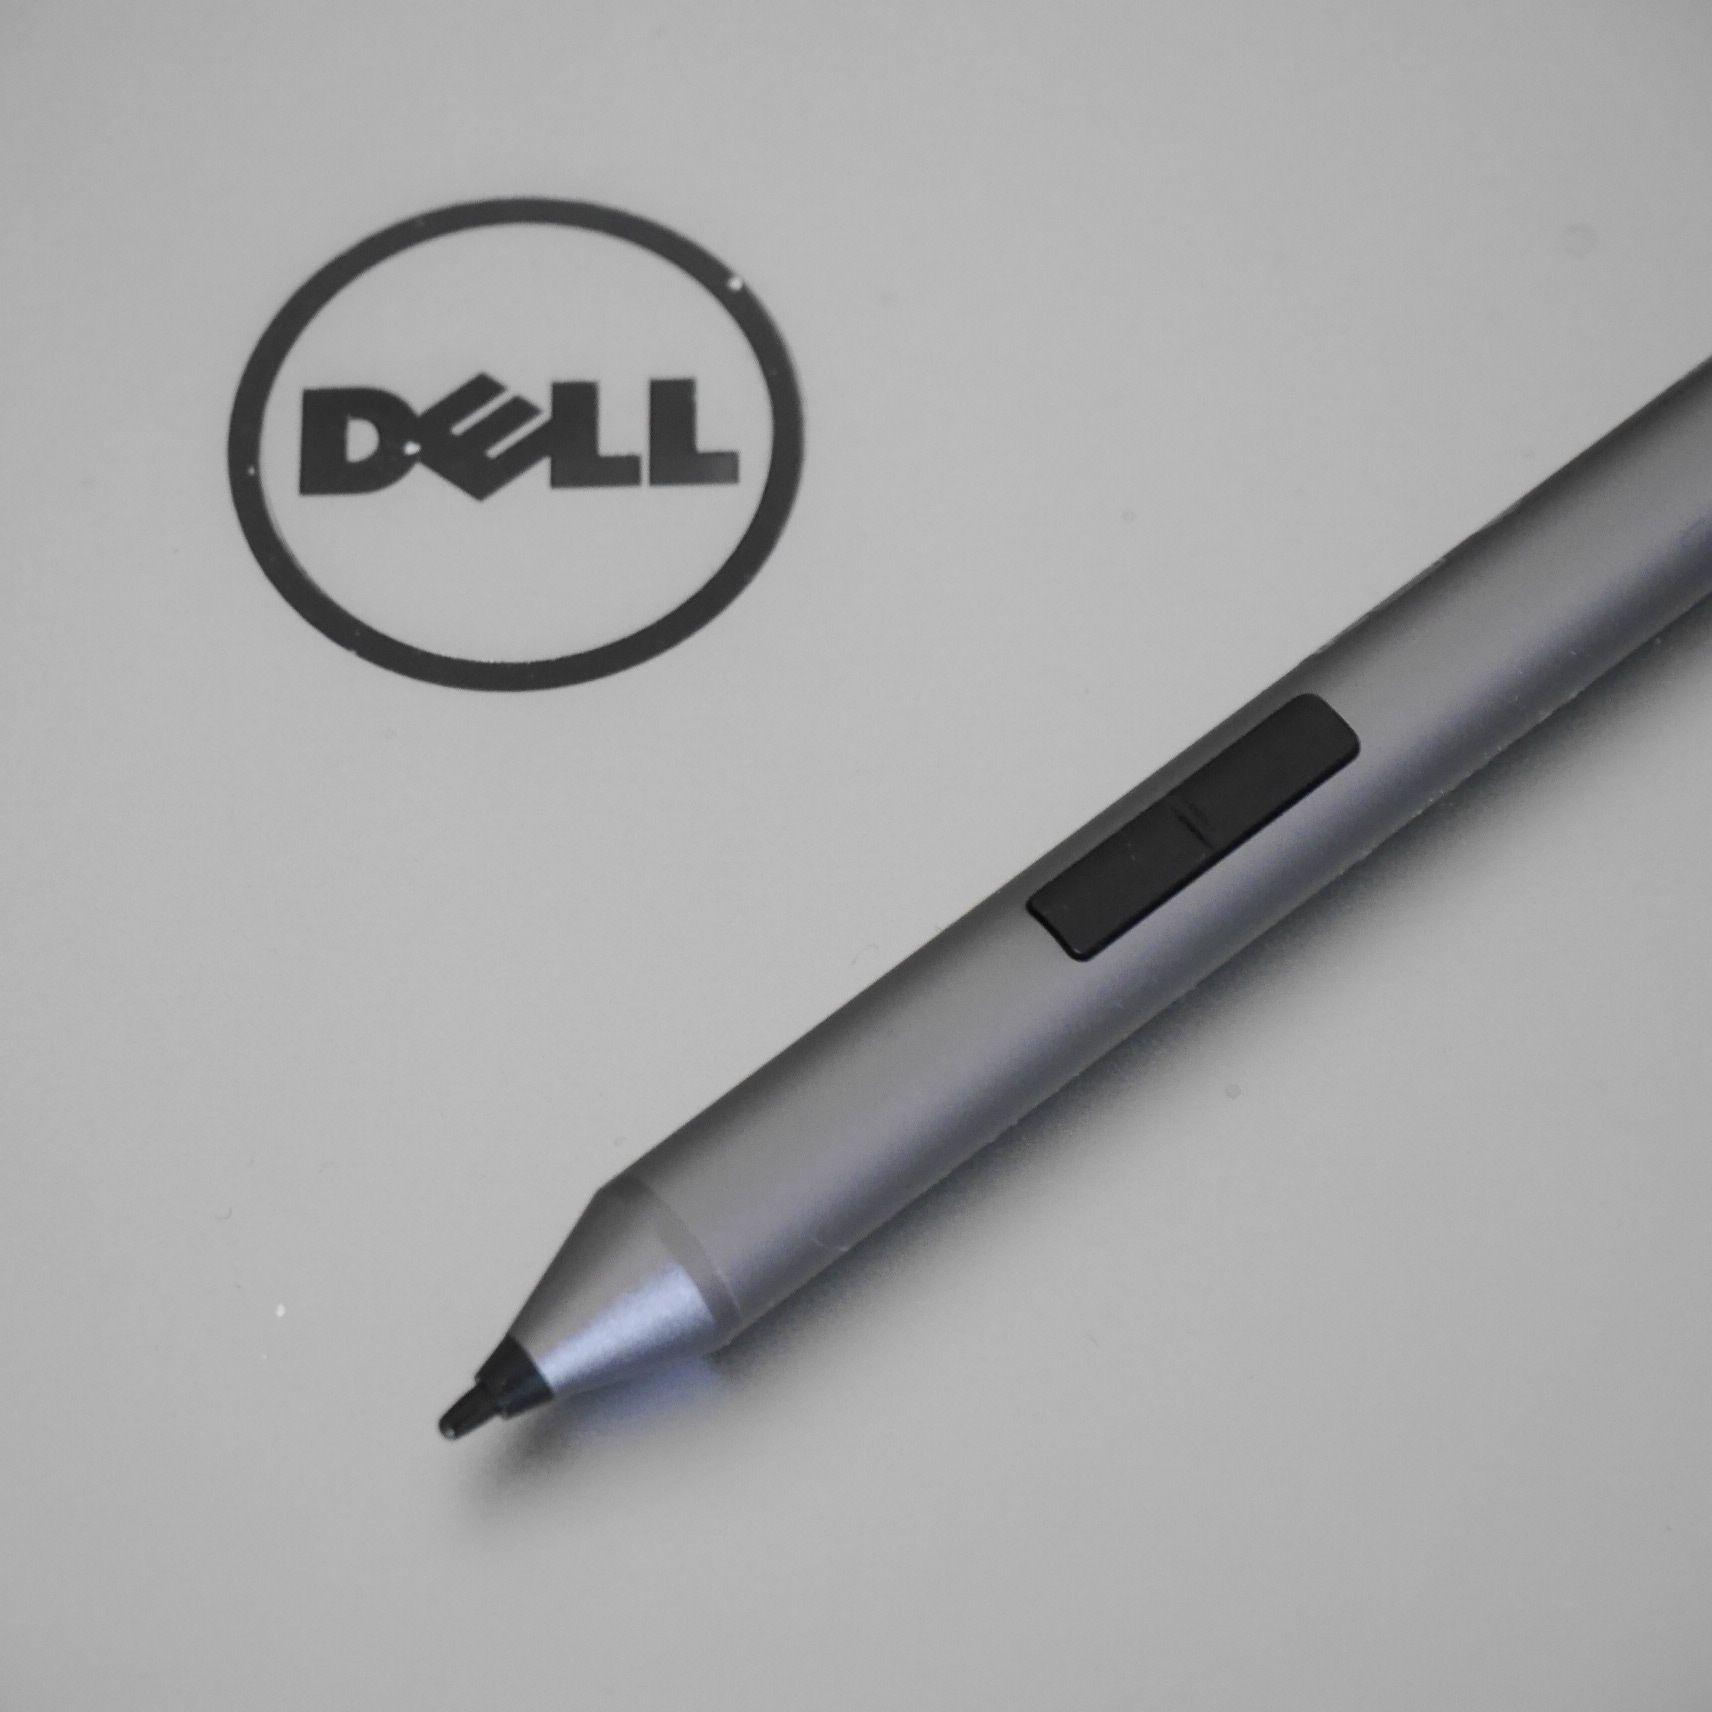 Dell_XPS_スタイラスペン_up